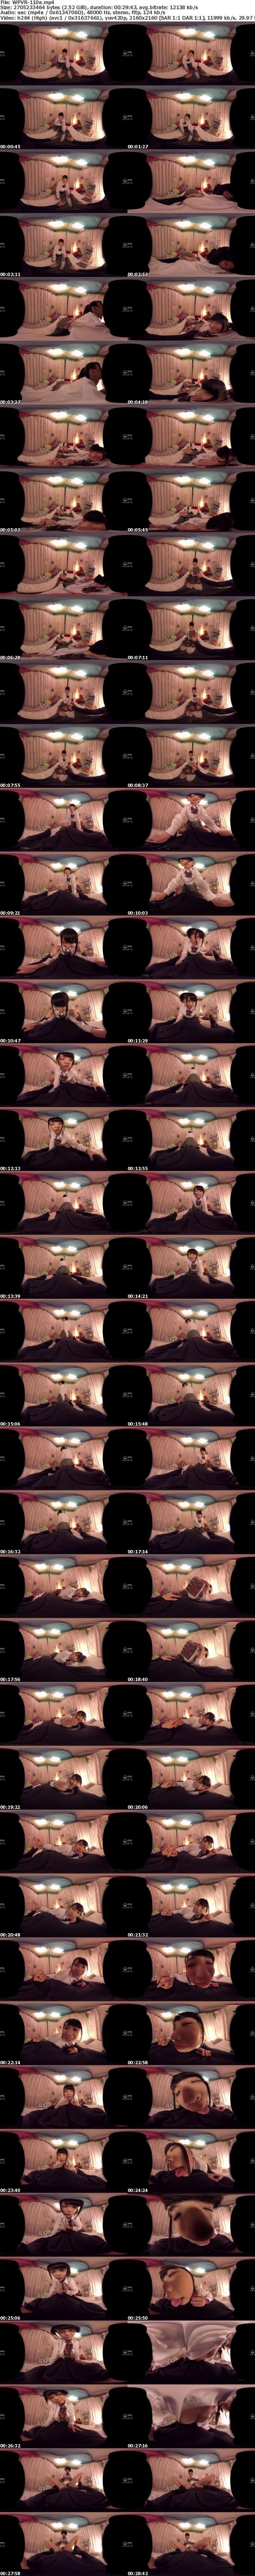 VR/3D [WPVR-110] 【VR】エロ行為絶対禁止!の健全リフレ店で押しに弱い性格良し子ちゃんとコソコソ裏オプ性交 高杉麻里